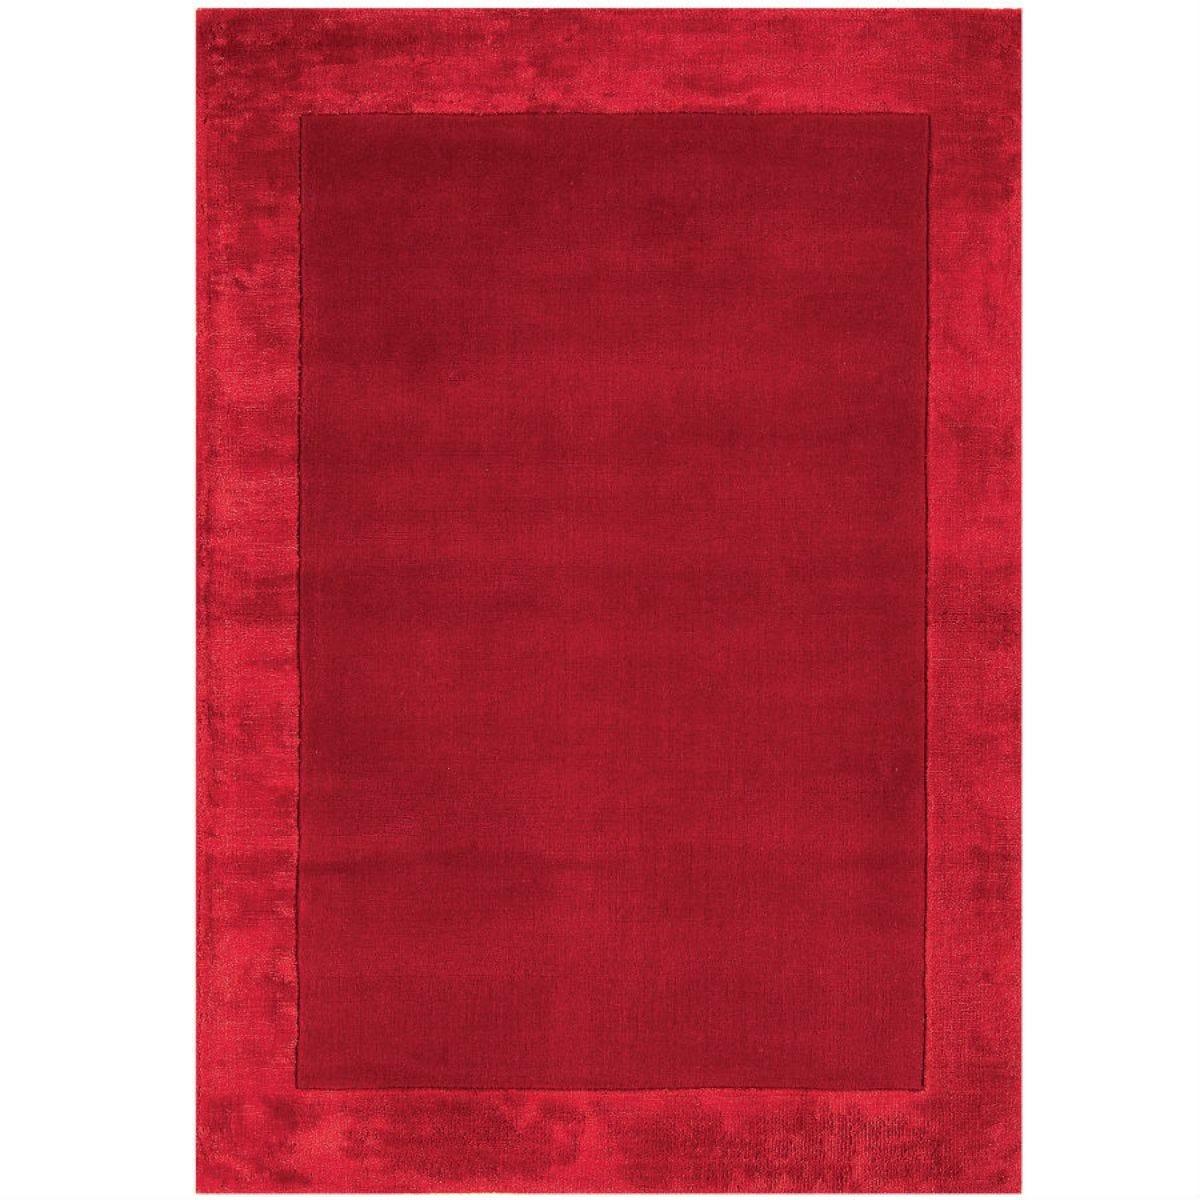 Asiatic Ascot Rug, 160 x 230cm - Red